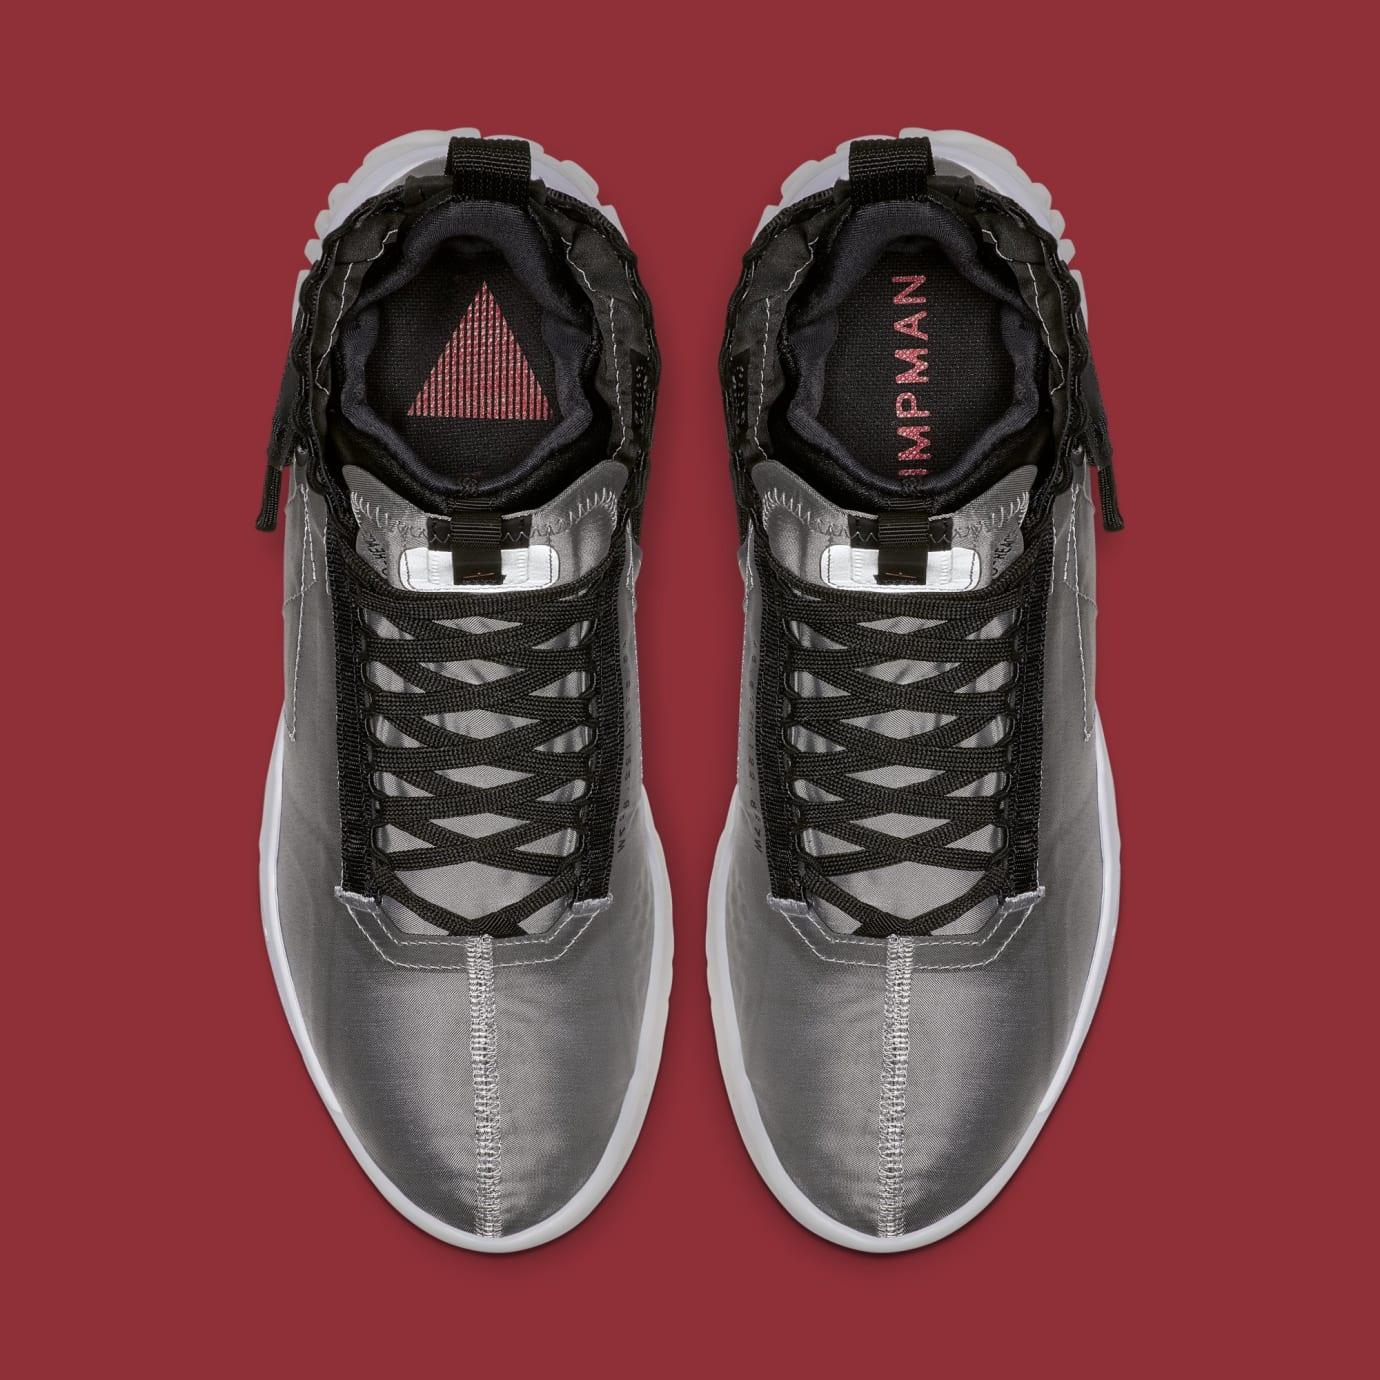 Jordan Proto React 'Grey/Black' BV1654-002 (Top)